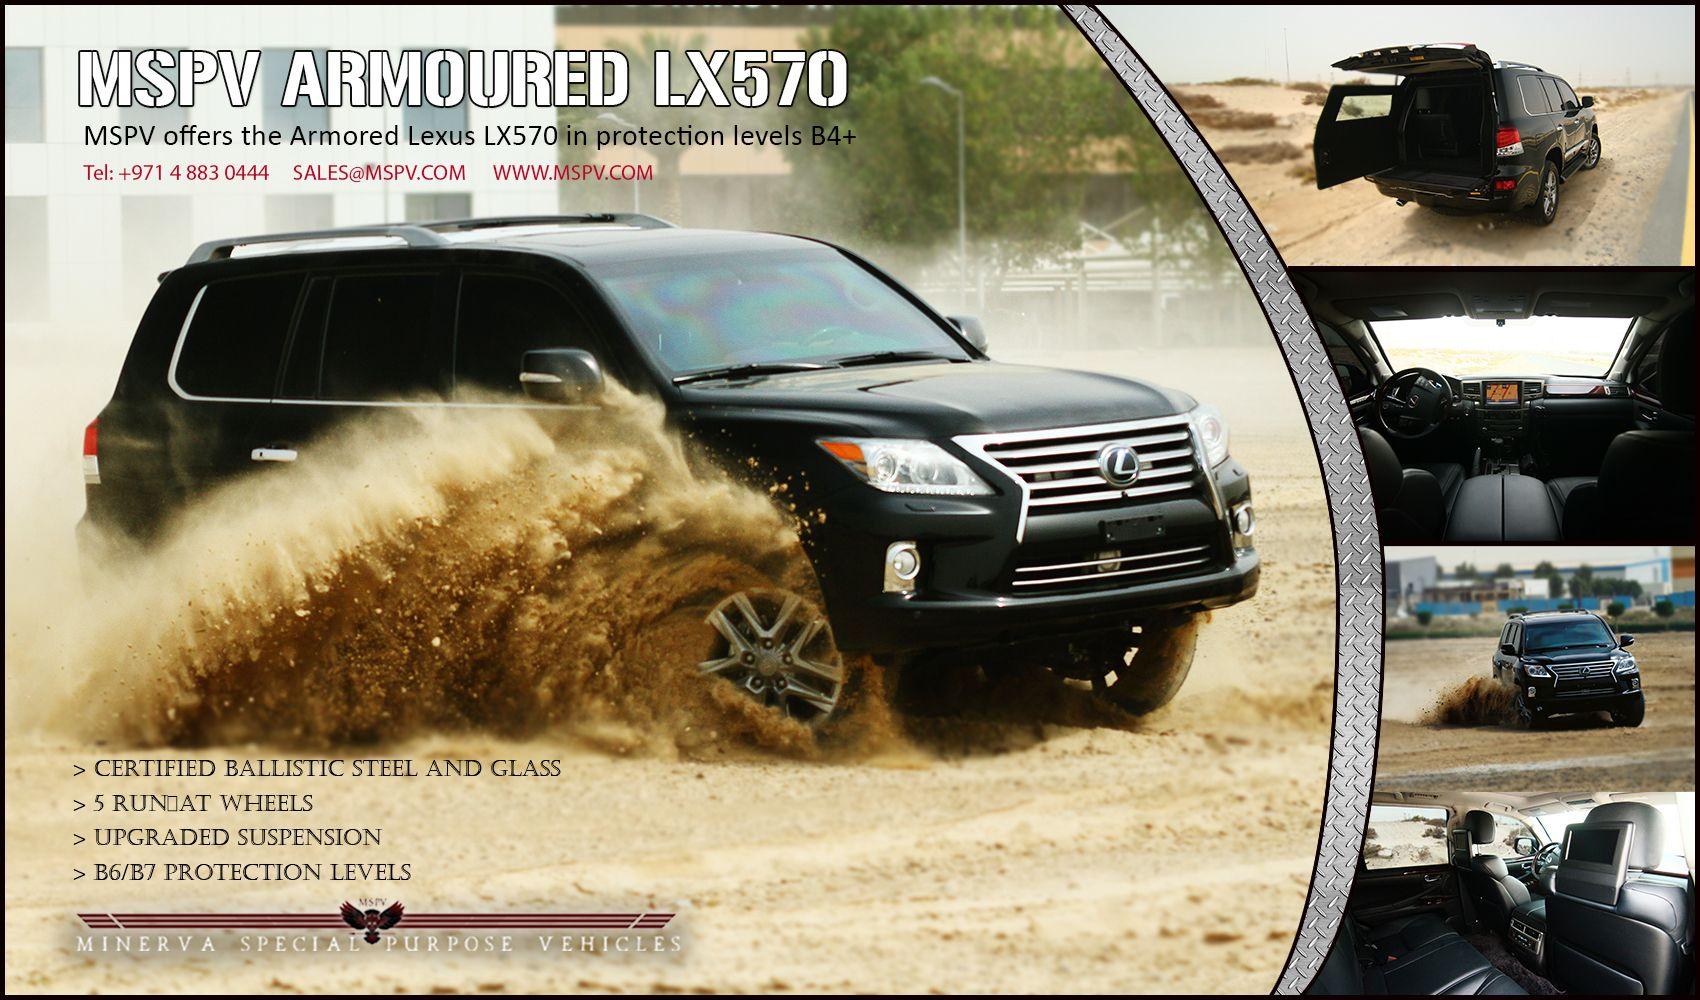 Armored Lexus LX570